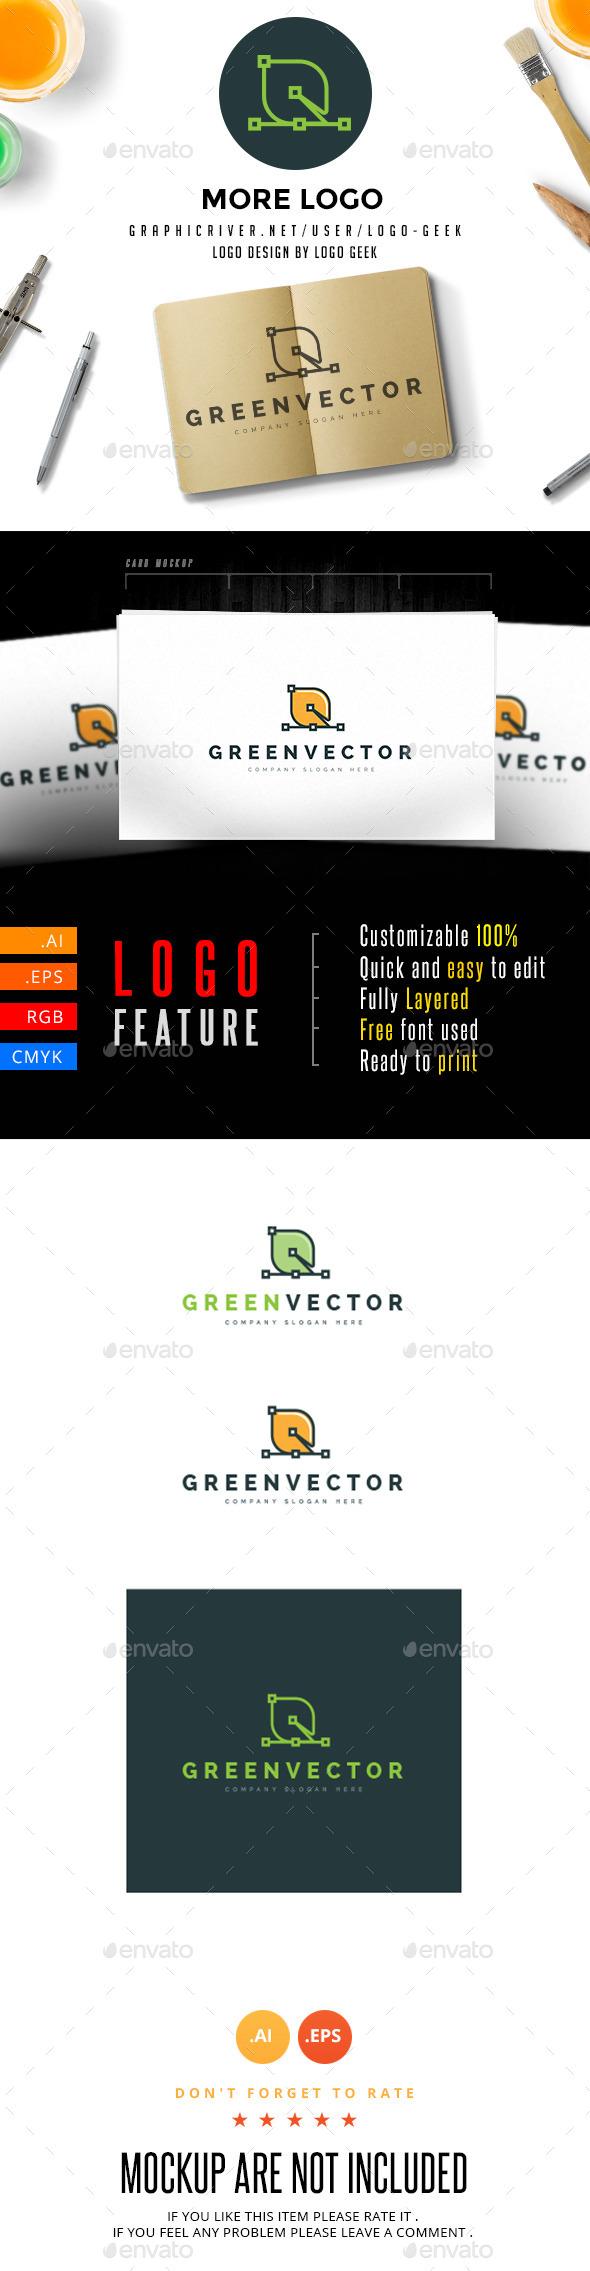 GraphicRiver Green Vector 10960818